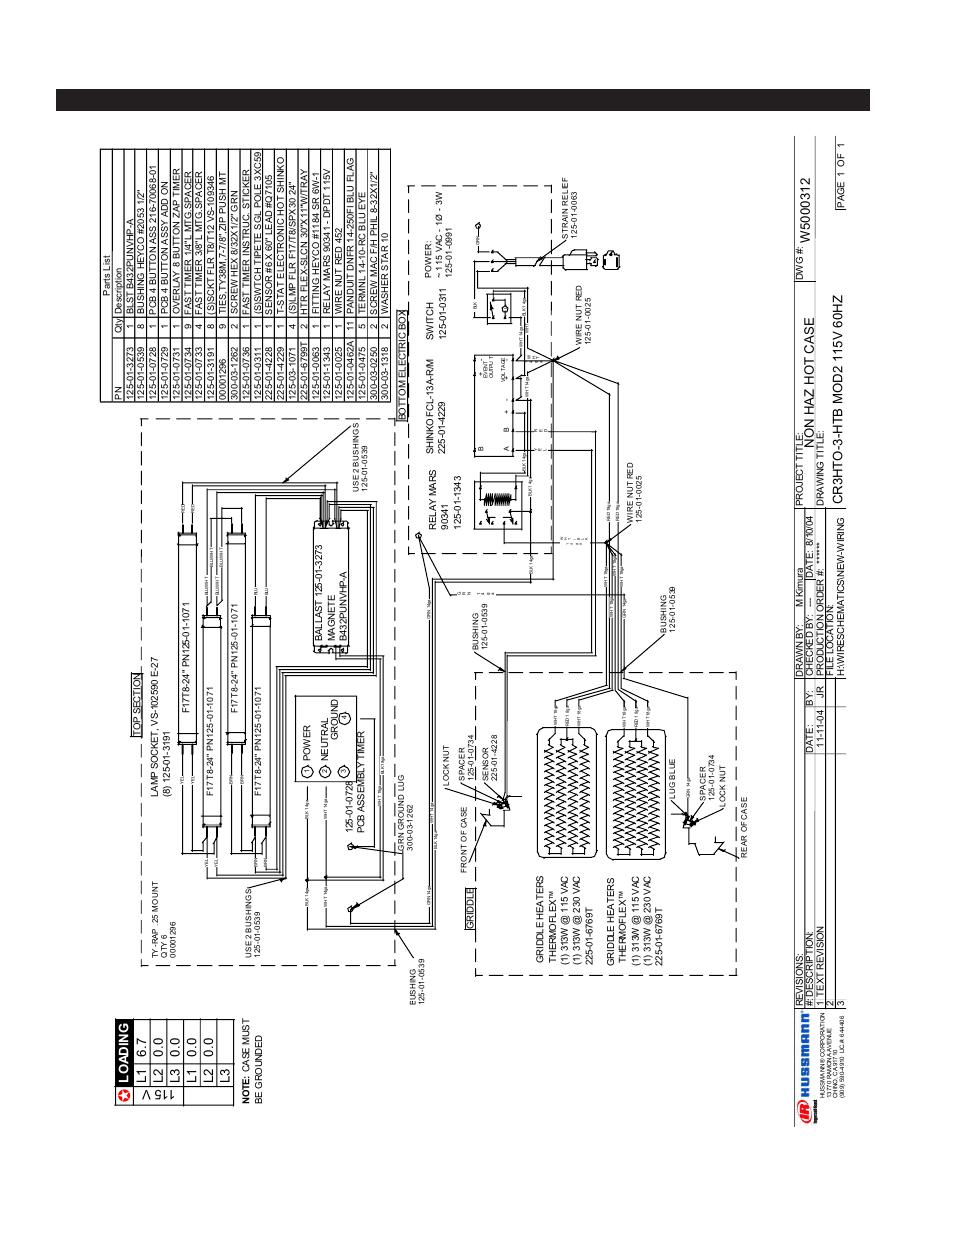 Hussman Wiring Diagrams Schematic Traulsen Ur48wt Hussmann Diy Enthusiasts U2022 Mustang Harness Diagram